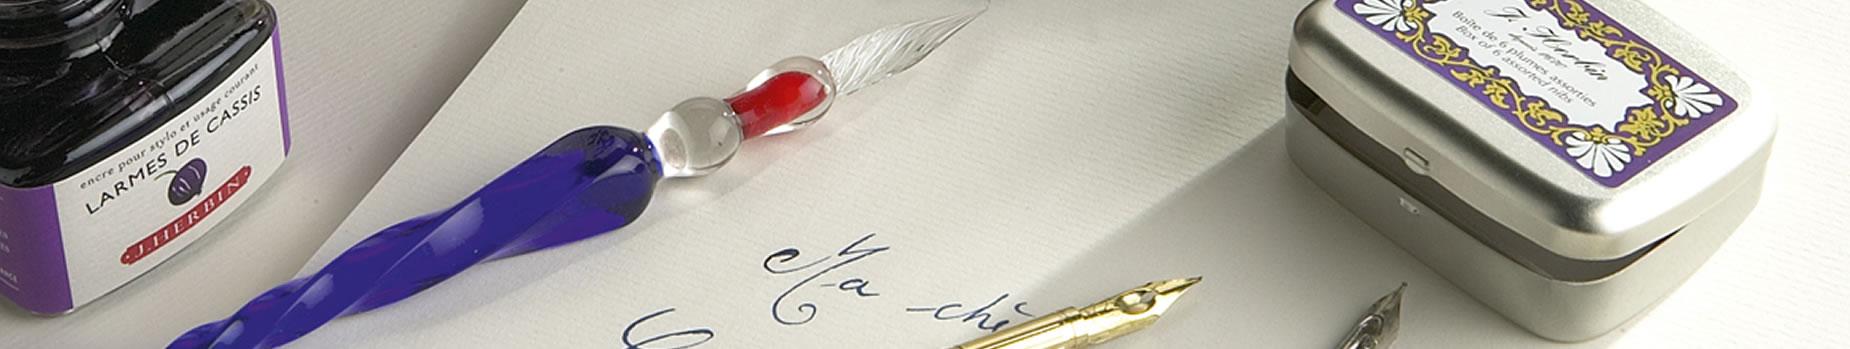 Glass Pen Venetian Writing Set